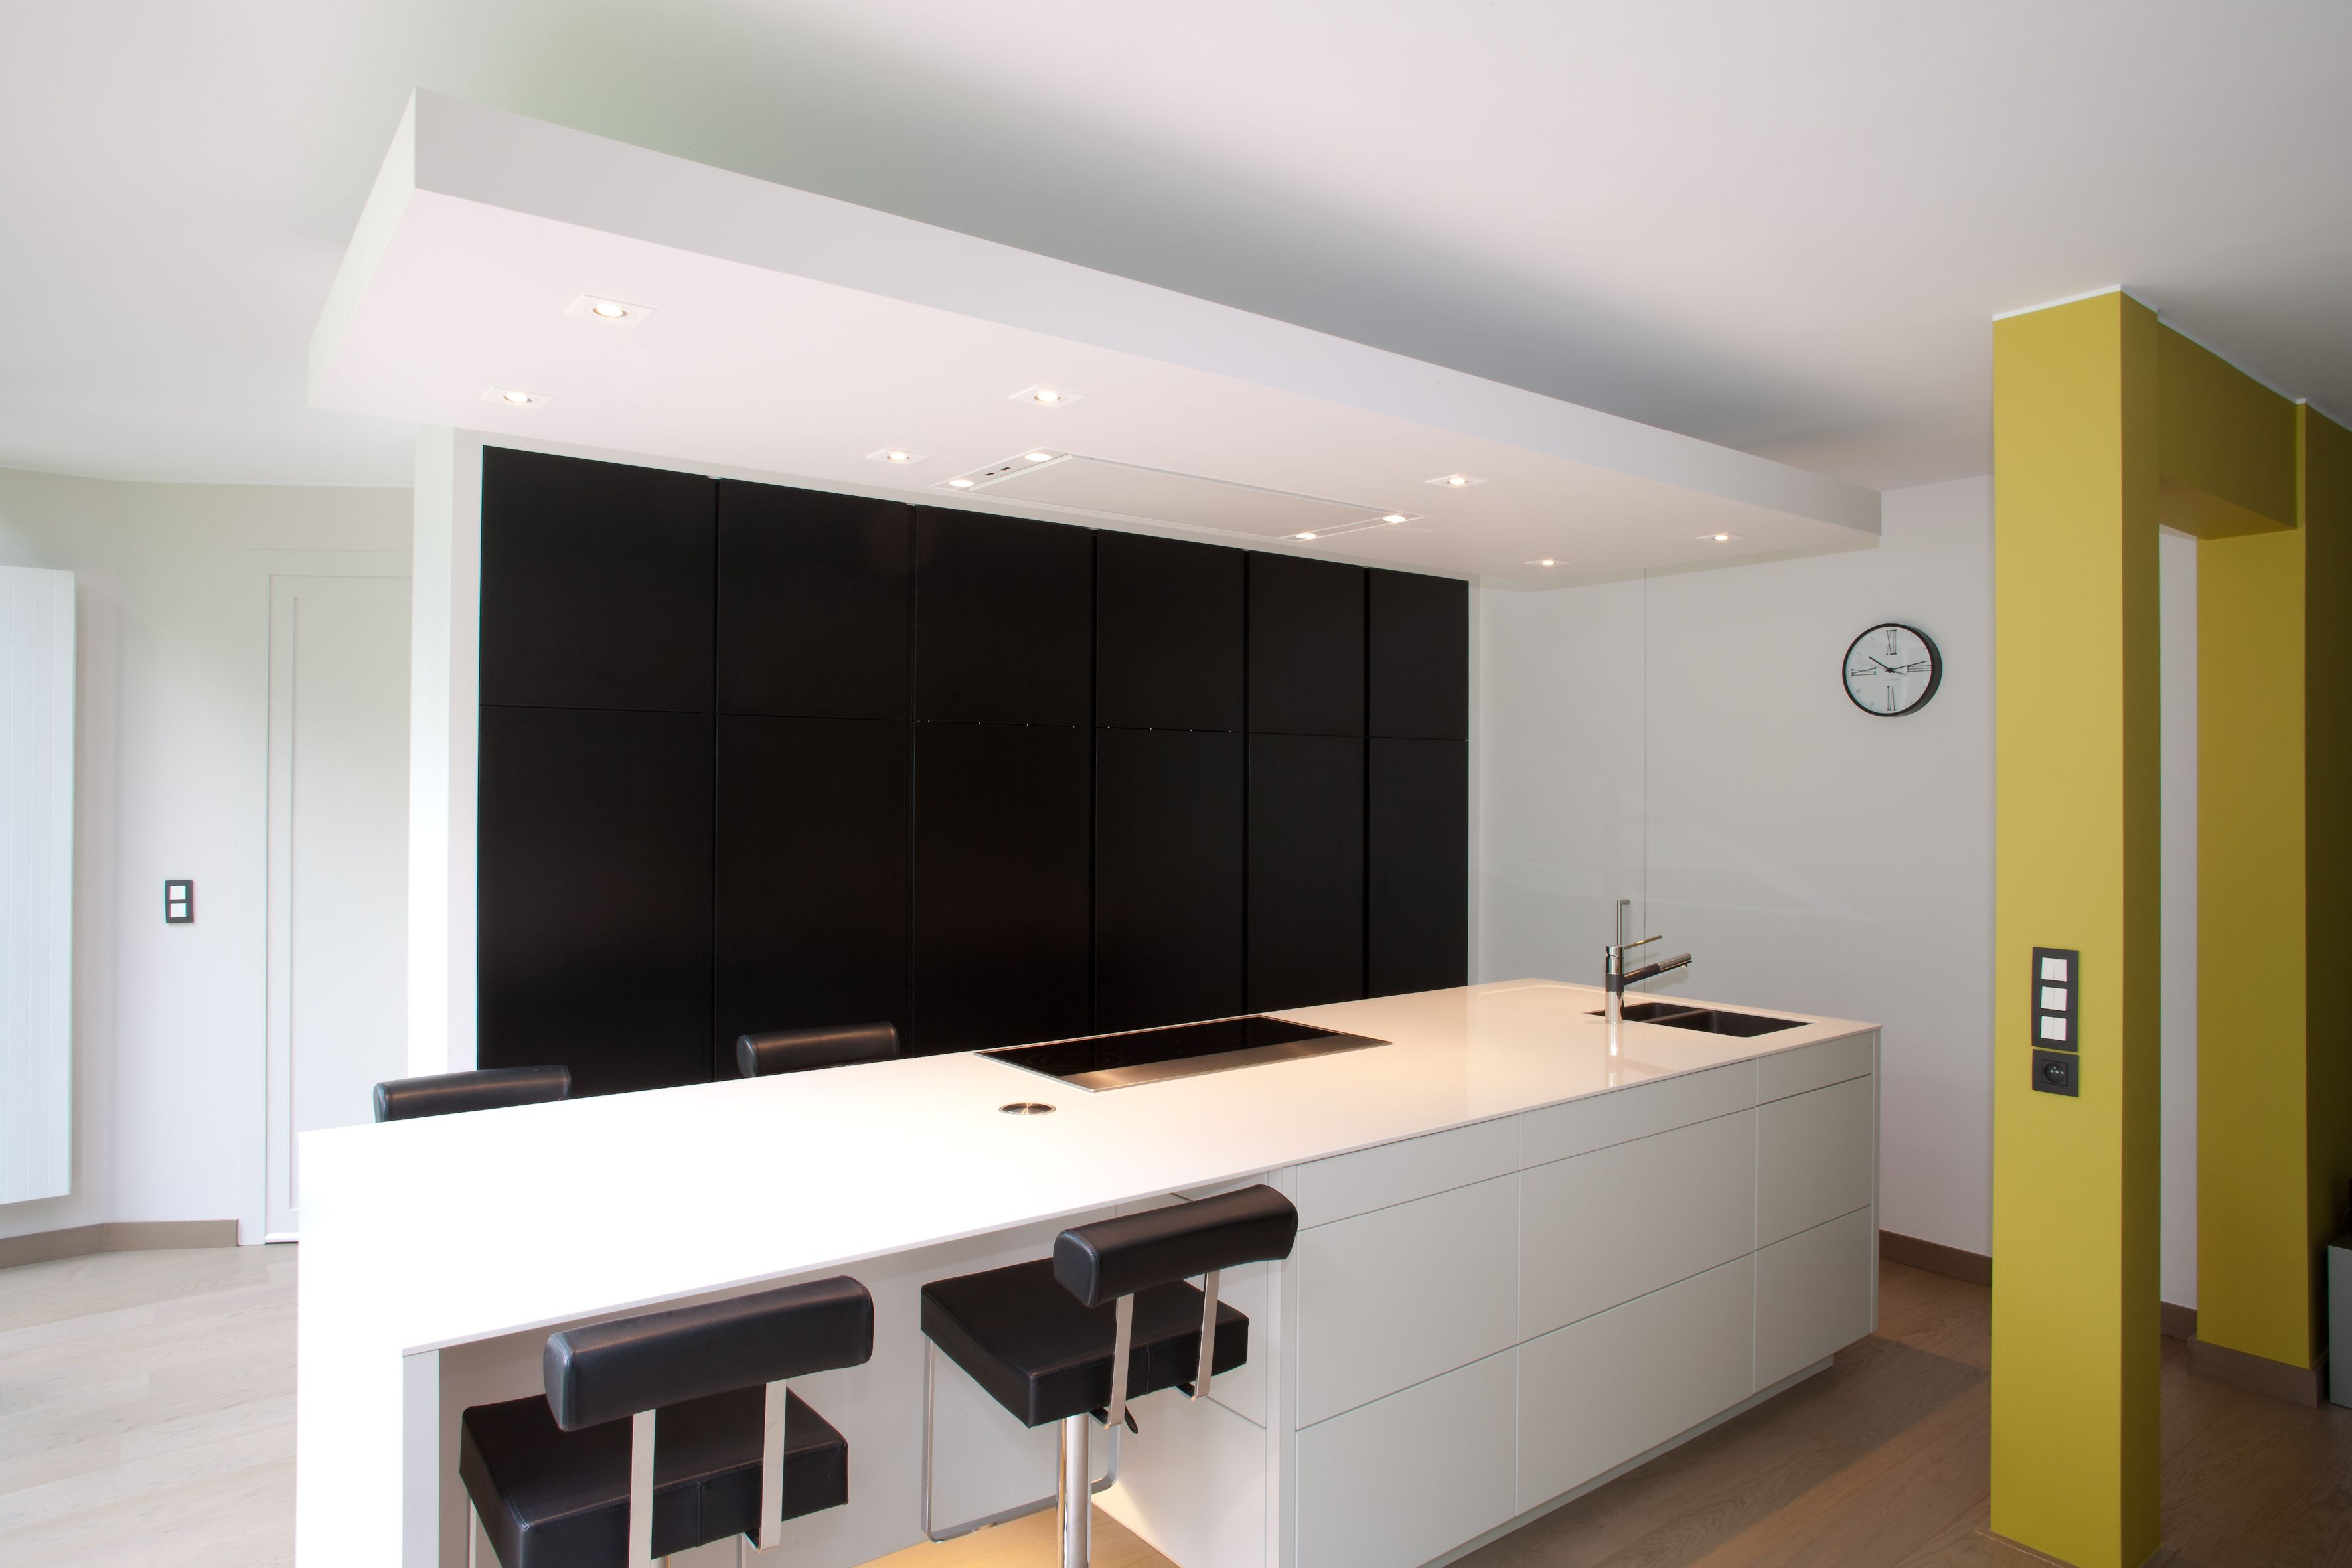 Black & white keuken met push systeem verborgen apparaten en